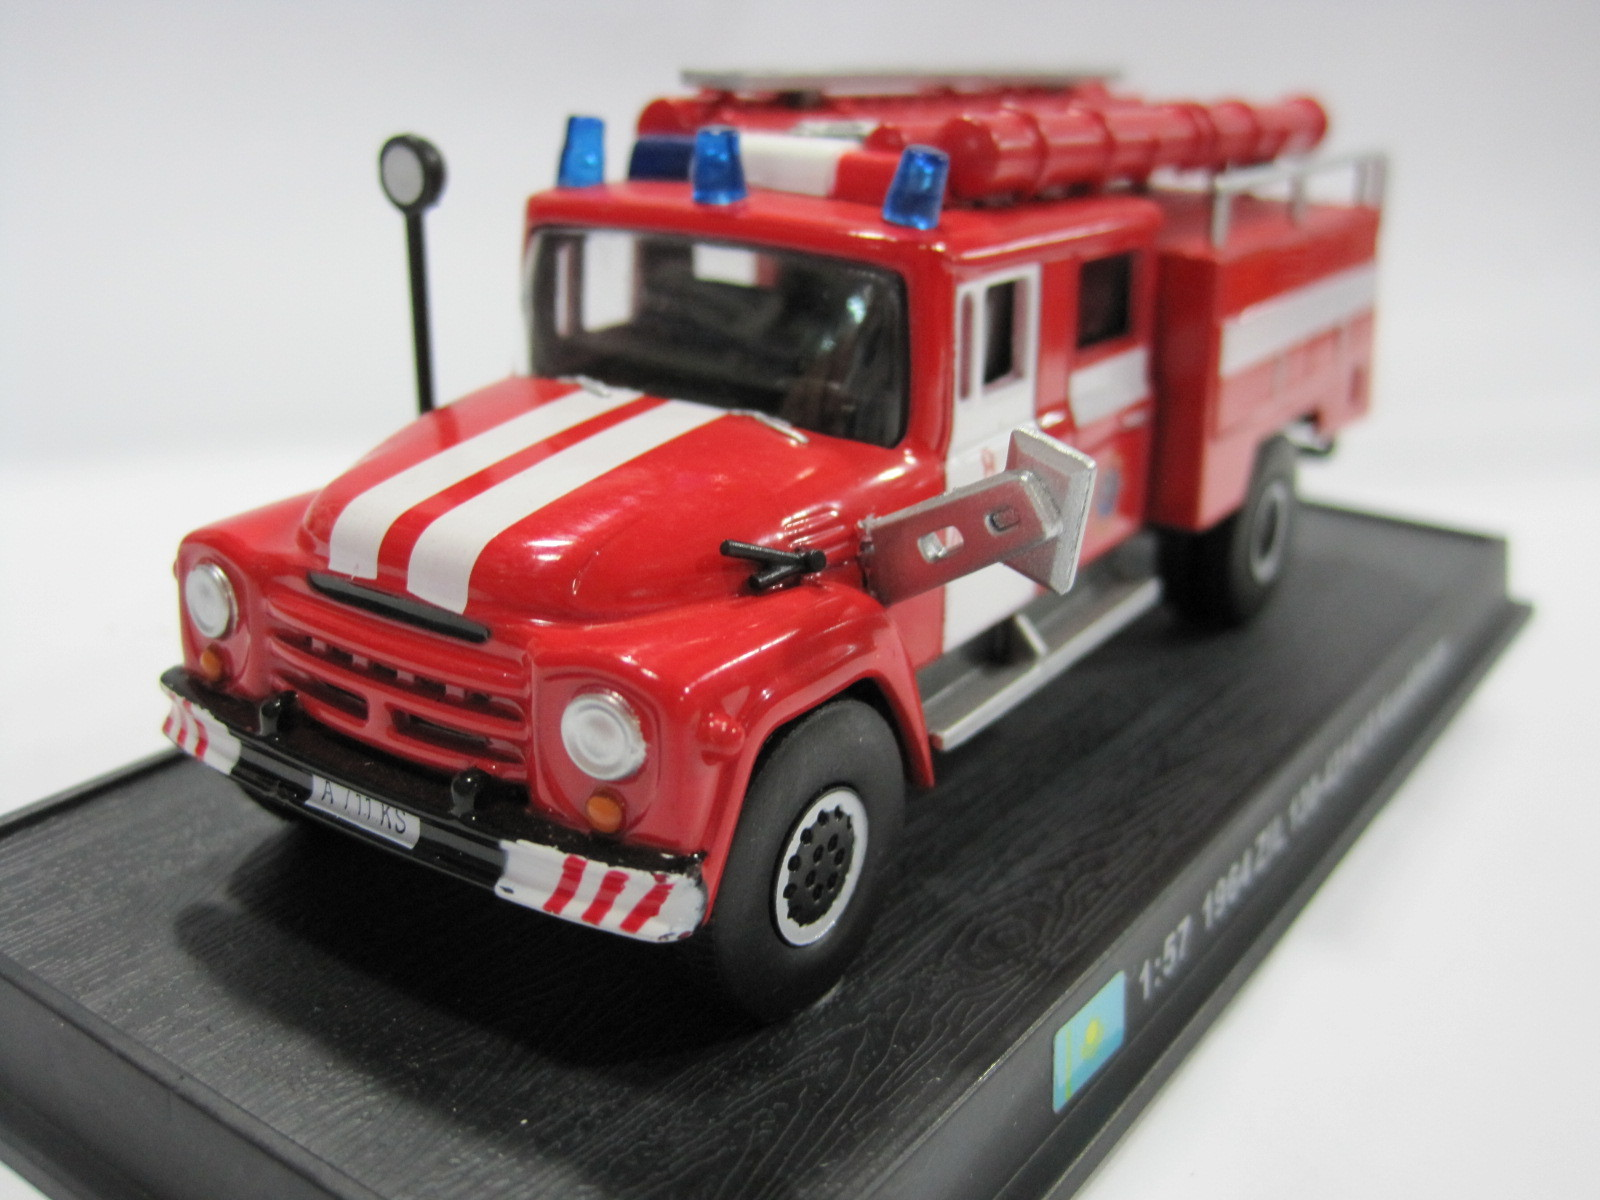 AMER 1/57 Scale 1964 ZiL 130-431410 Kazakhstan Fire Engine Diecast Metal Car Model Toy F ...